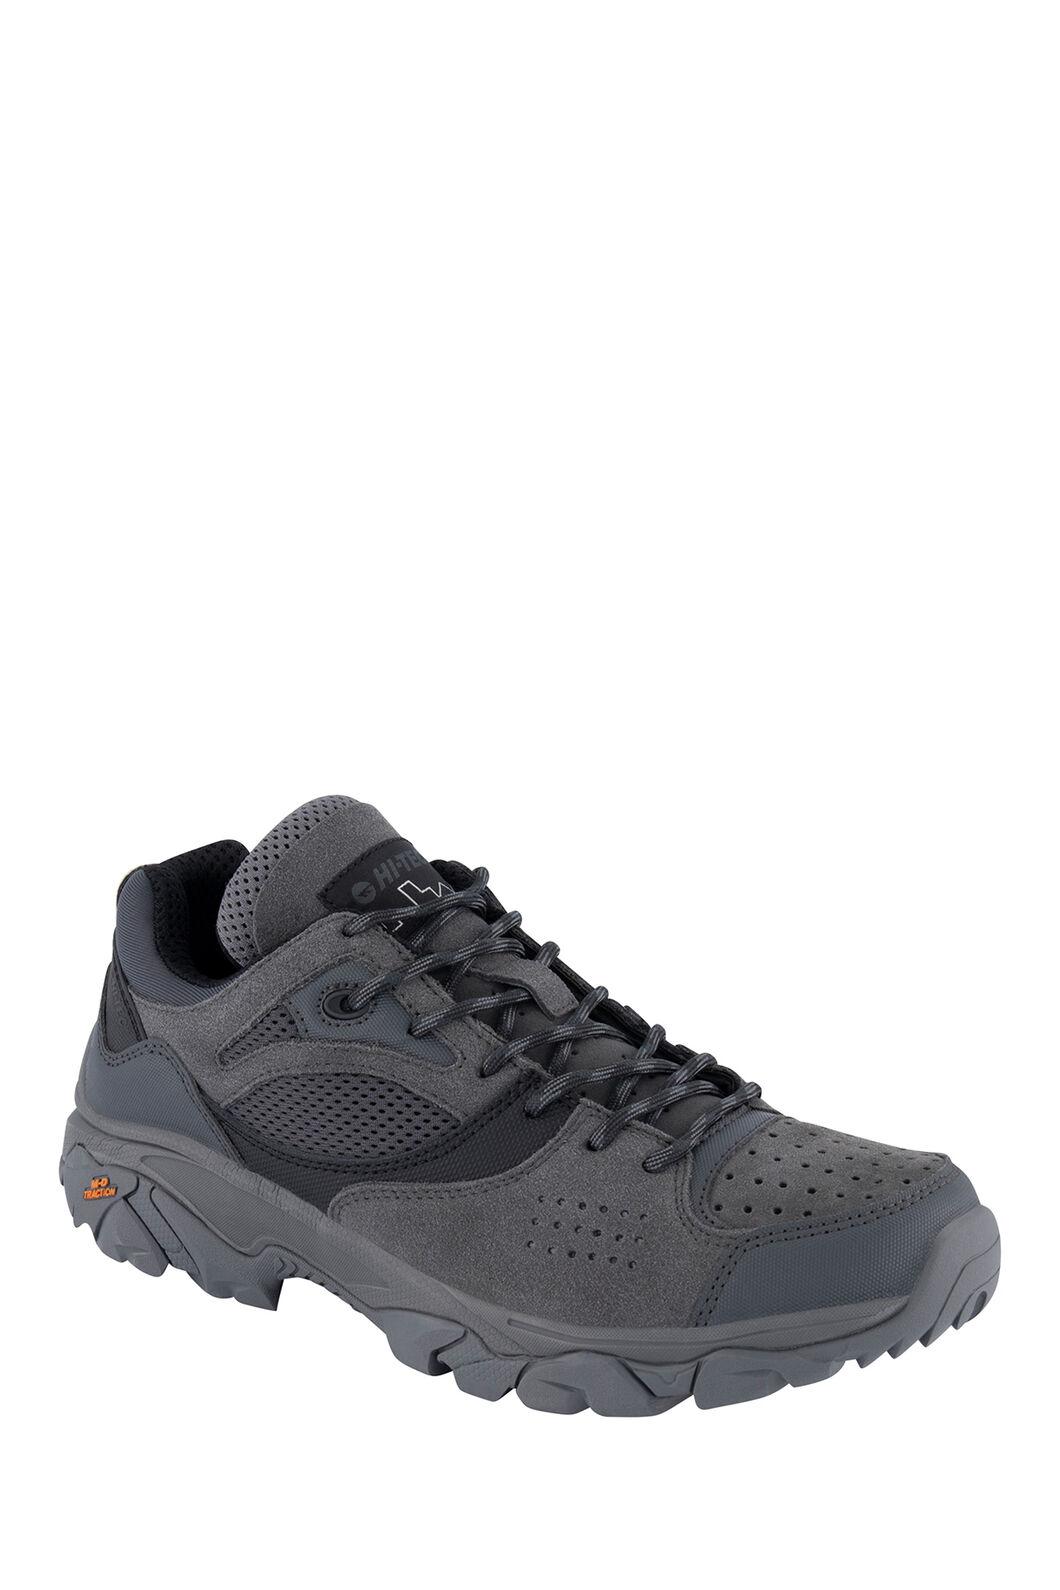 Hi-Tec Nouveau Traction WP Hiking Shoes — Men's, Black/Charcoal, hi-res